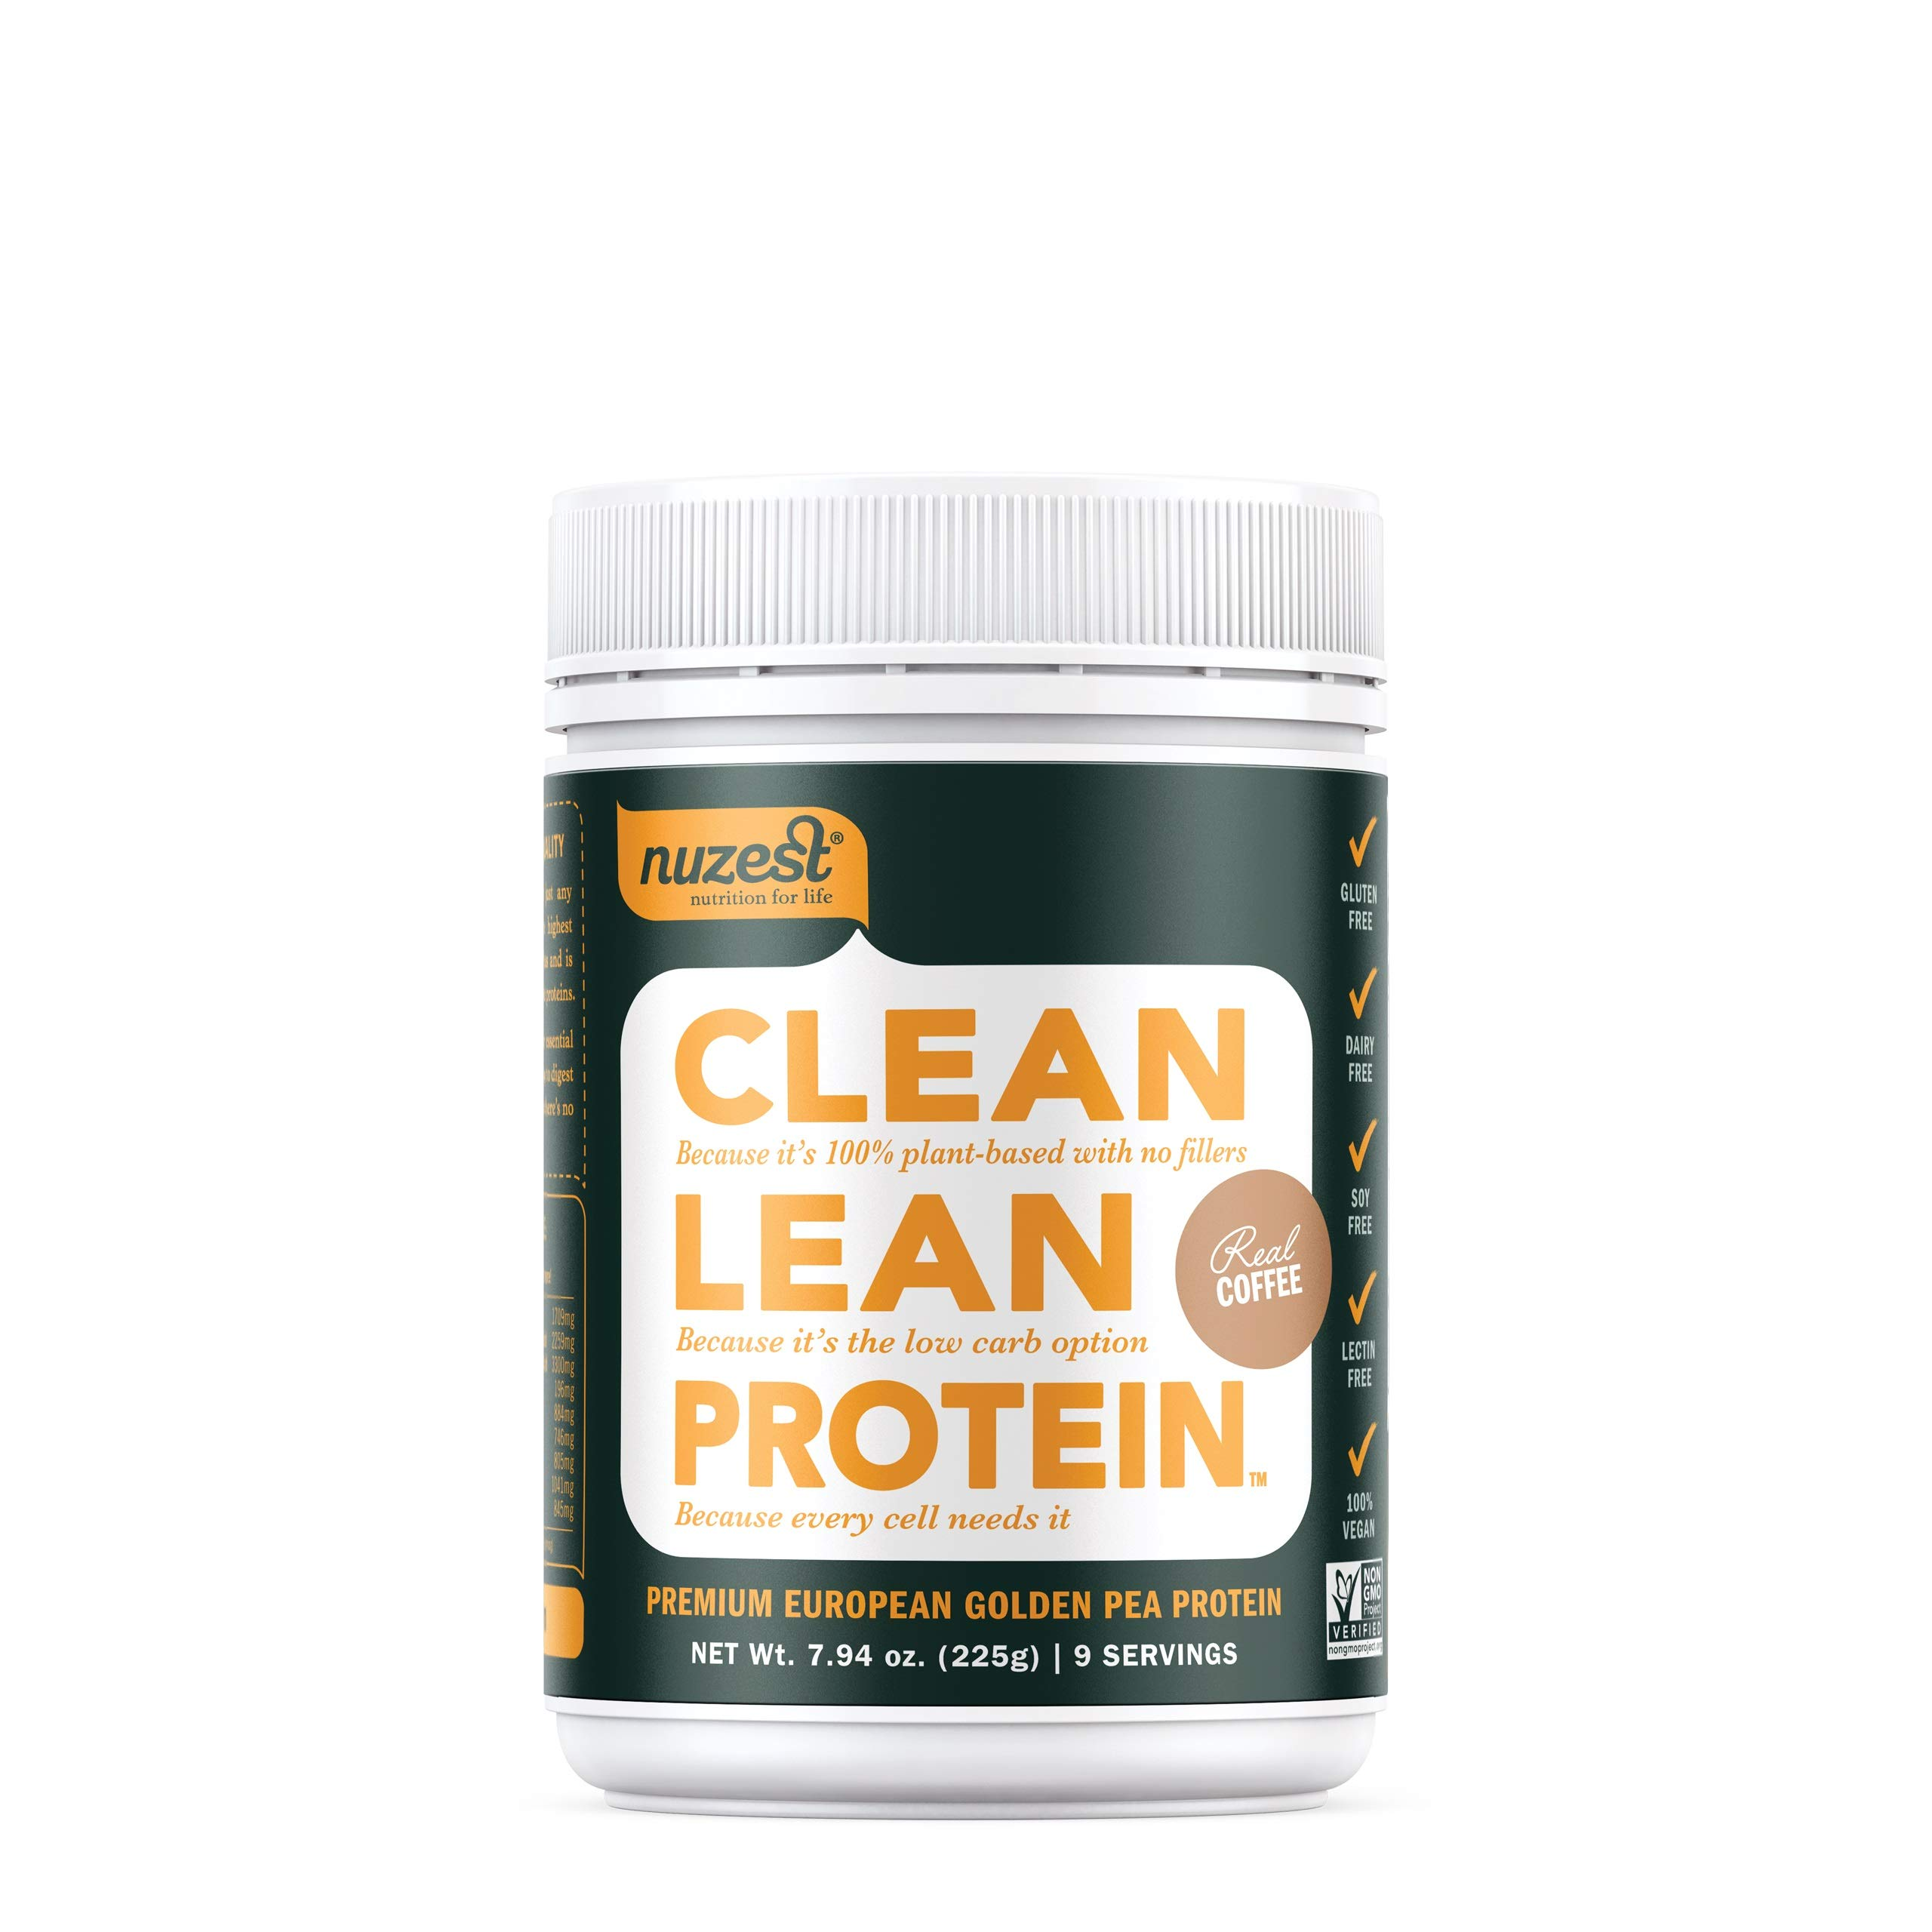 Nuzest Clean Lean Protein - Premium Vegan Protein Powder, Plant Protein Powder, European Golden Pea Protein, Dairy Free, Gluten Free, GMO Free, Naturally Sweetened, Real Coffee, 9 Servings, 7.9 oz